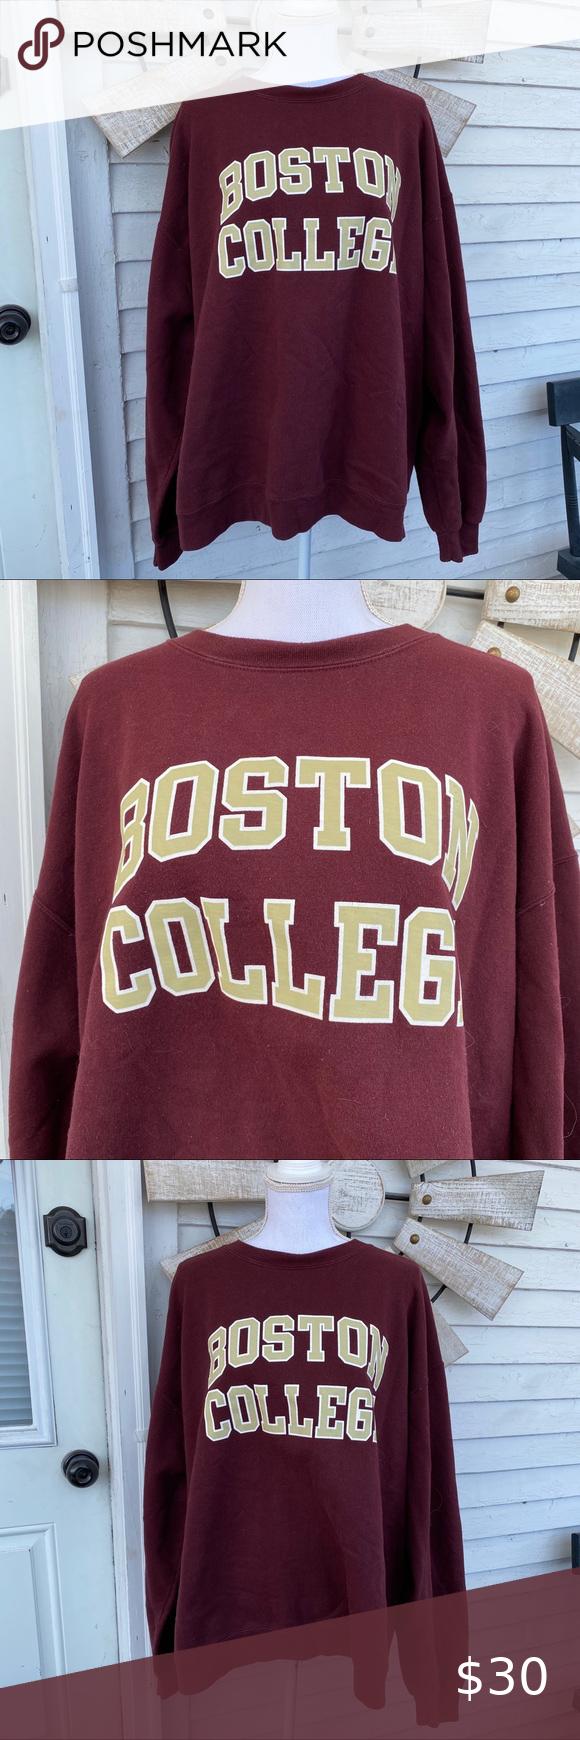 On Sale Vintage Boston College Reverse Weave Champion Etsy Sweatshirts Champion Sweatshirt College Sweatshirt [ 3000 x 1987 Pixel ]